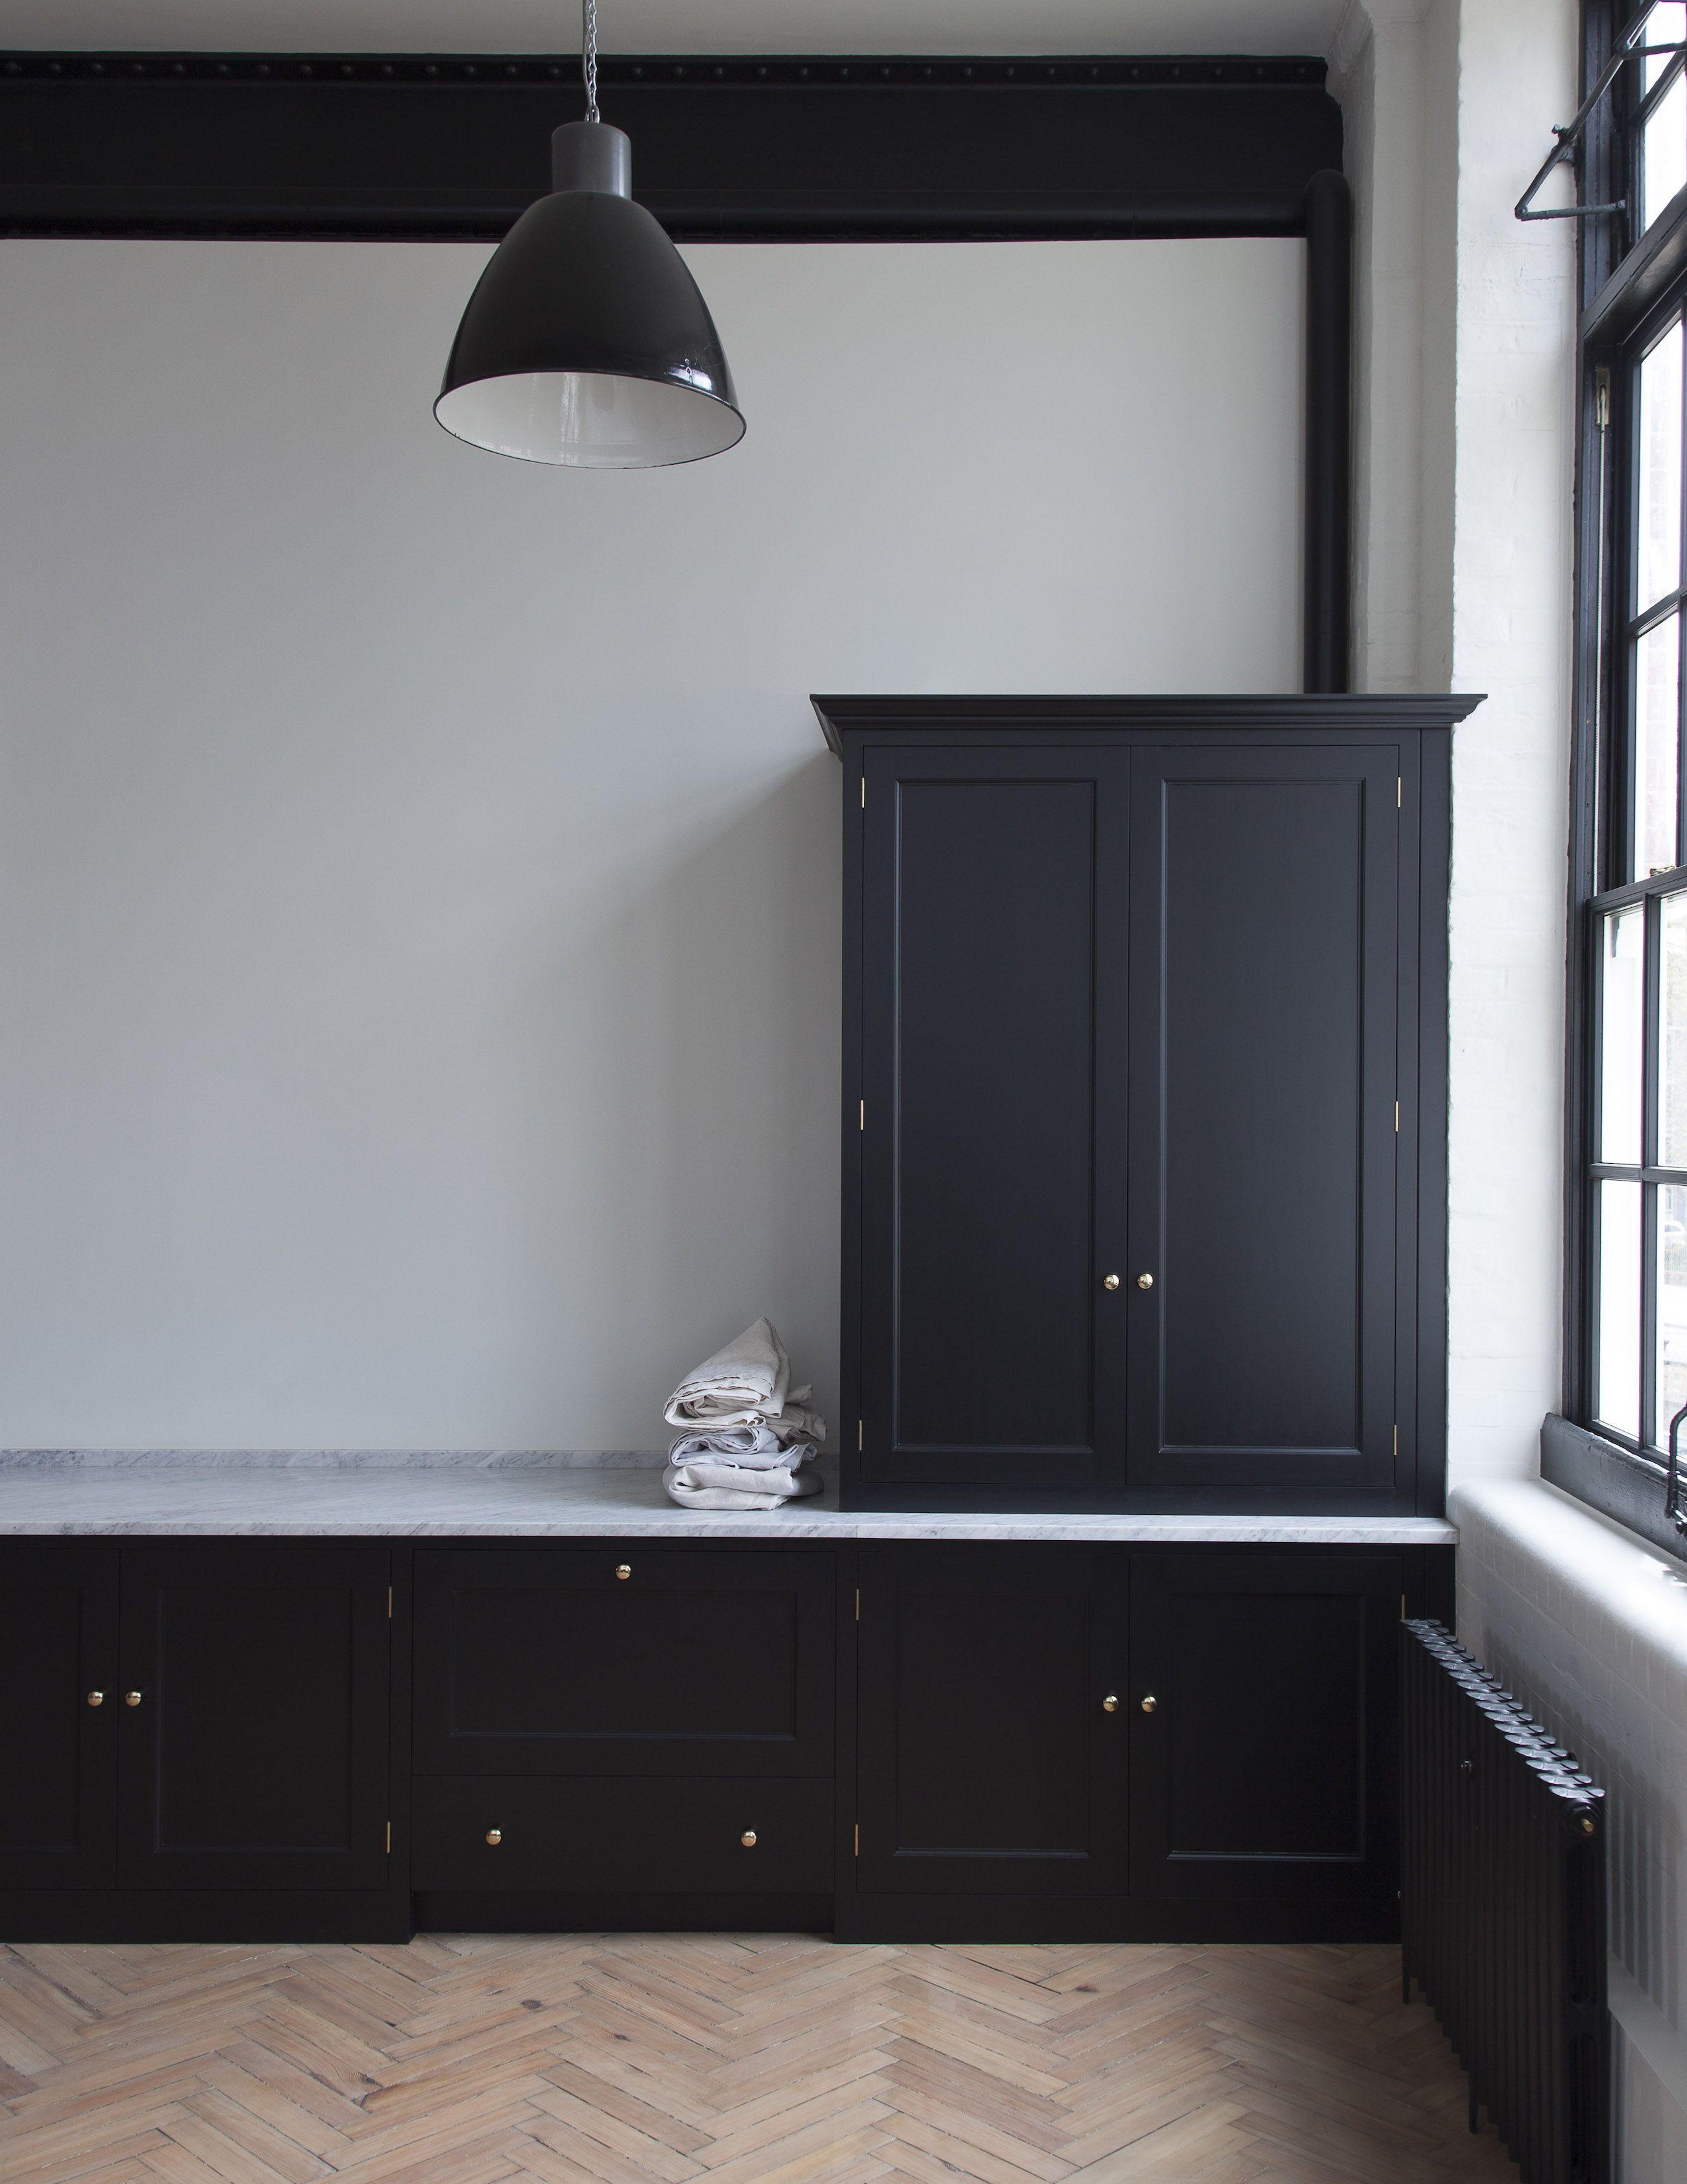 plain english bespoke british kitchen design comes to the us kitchen dining